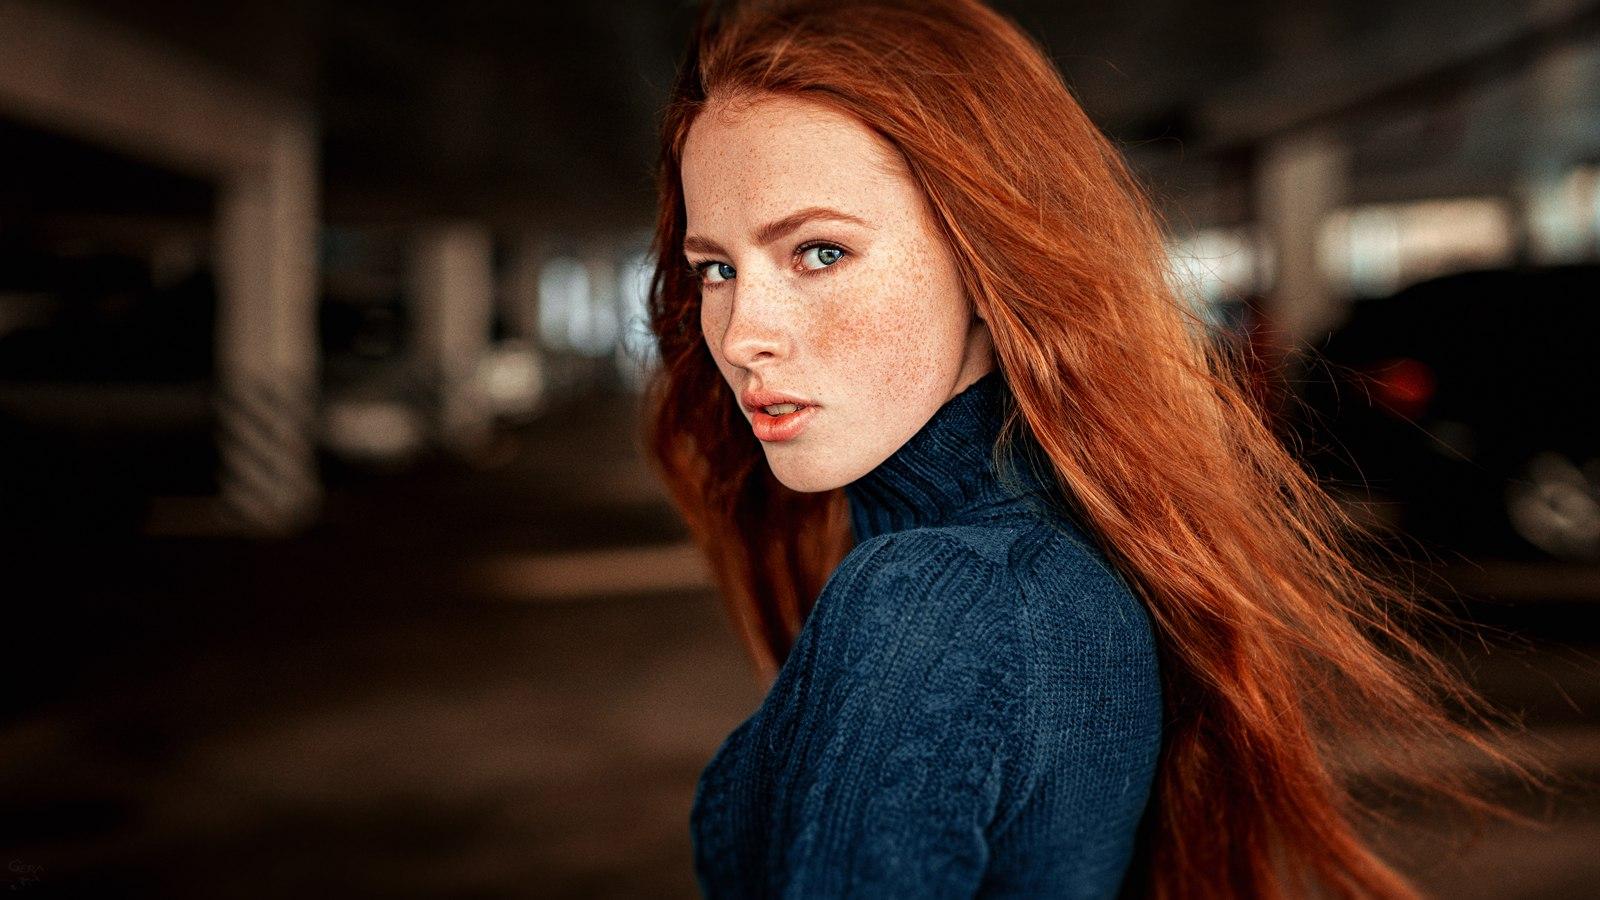 People 1600x900 redhead women model long hair looking at viewer parking garage face portrait Georgy Chernyadyev freckles